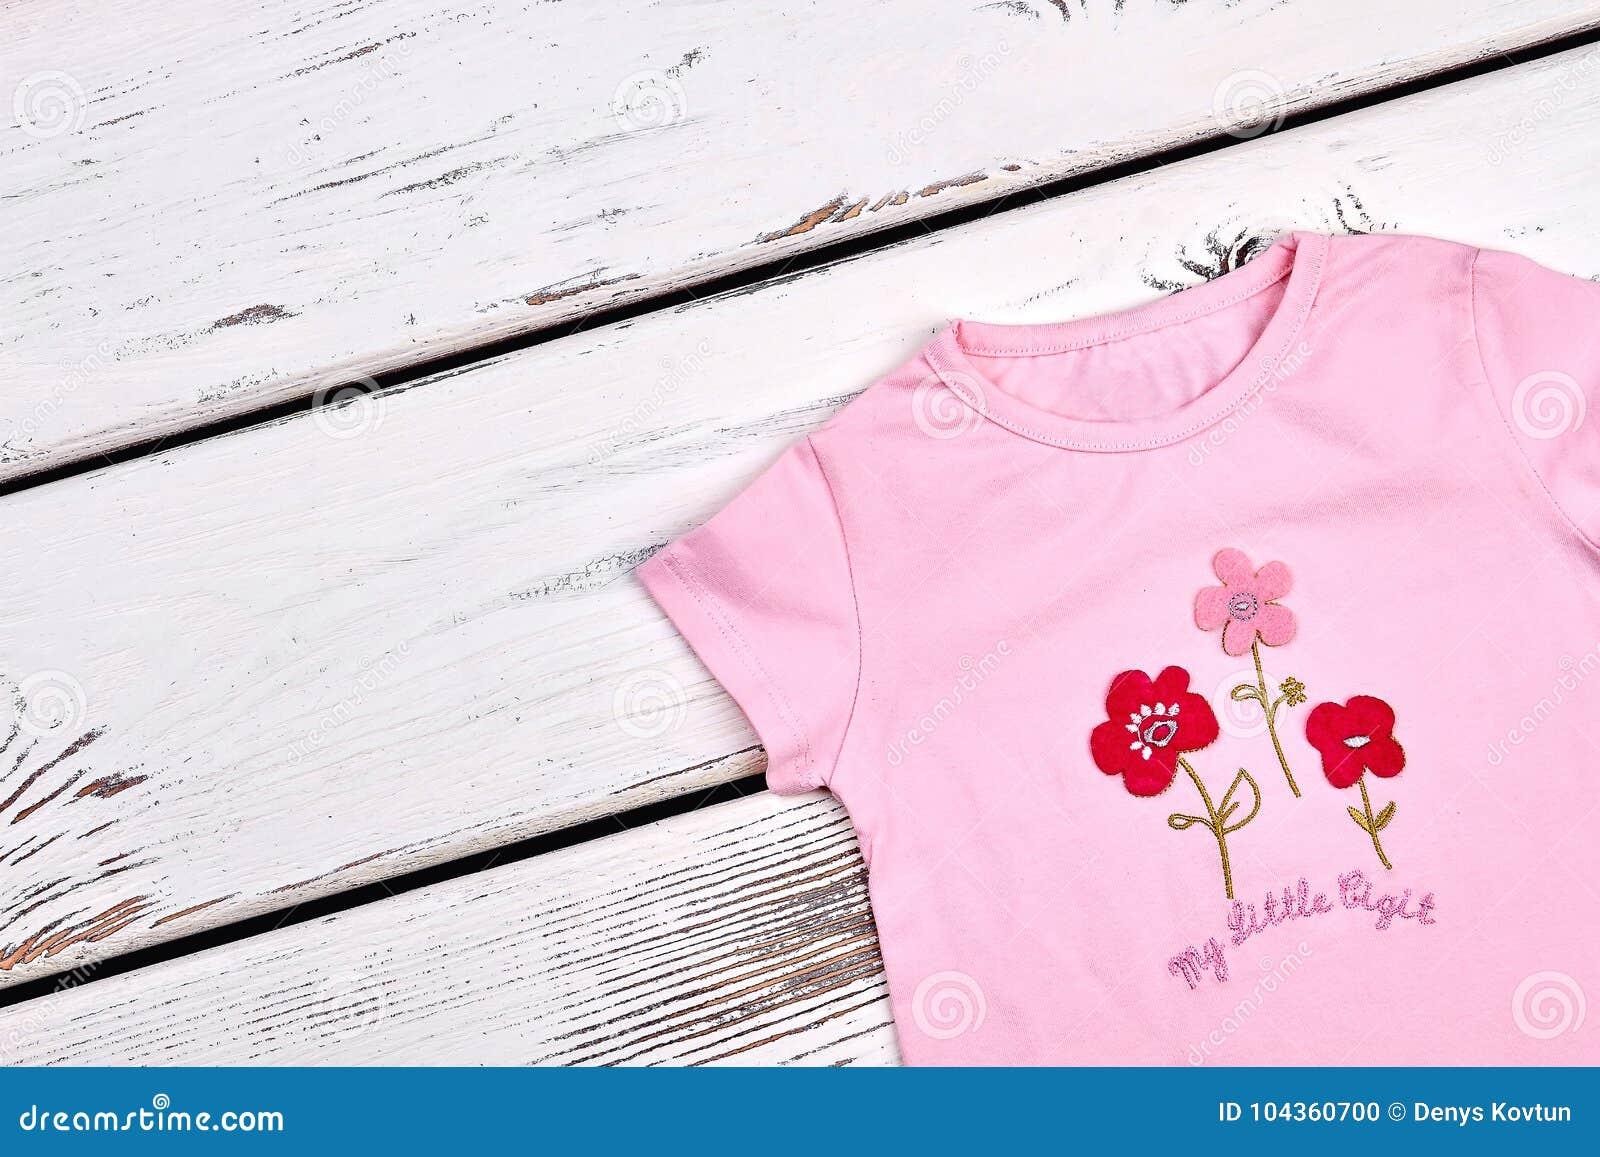 997eb8ab9 Baby-girl New Cartoon T-shirt. Stock Photo - Image of organic ...